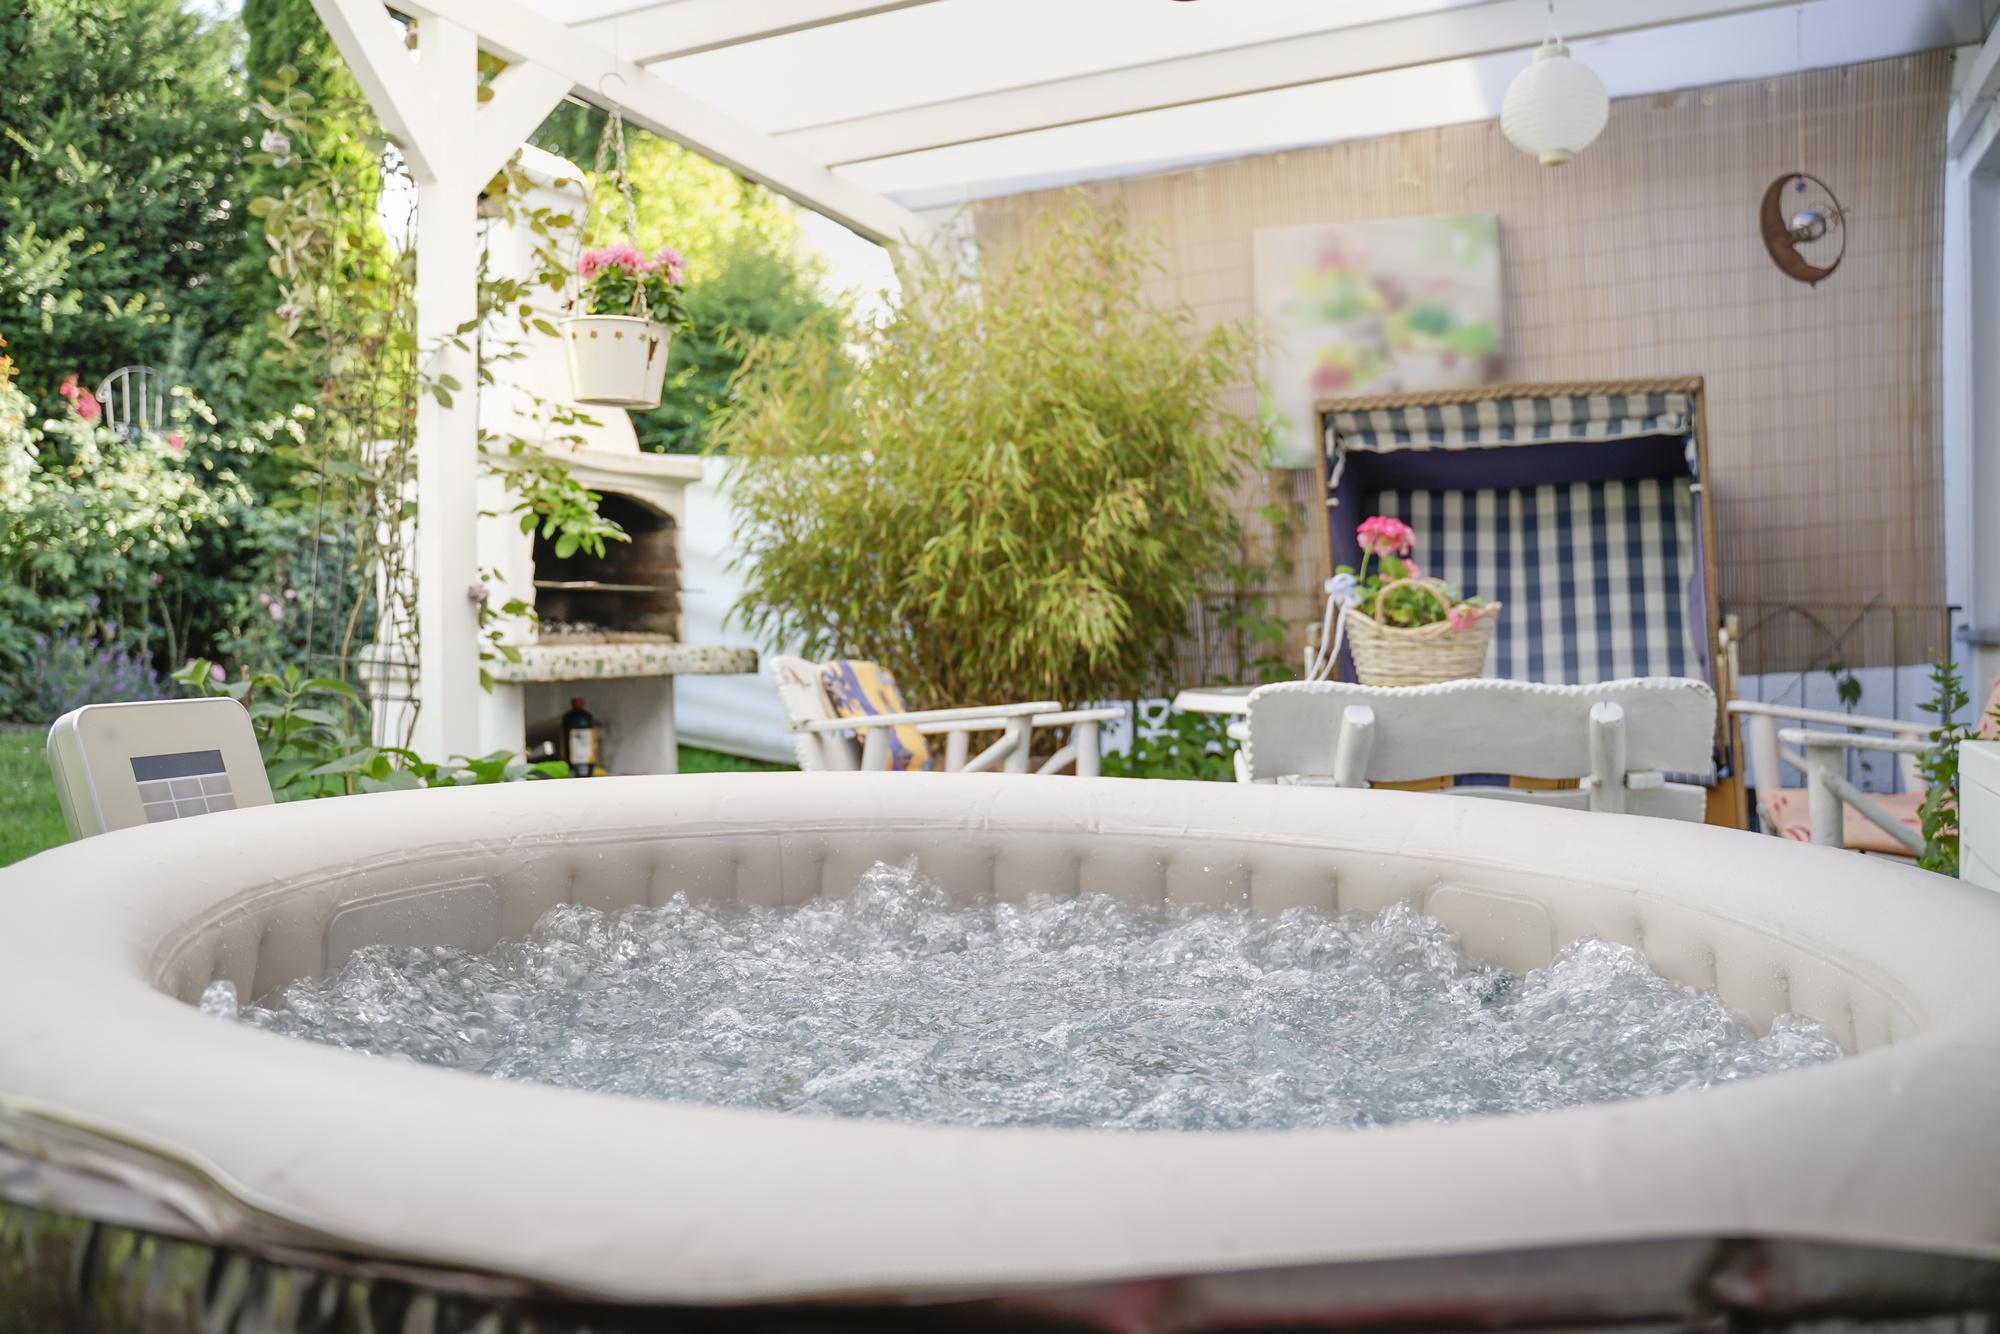 Transform Your Backyard Entertainment Into Your Dream Spa